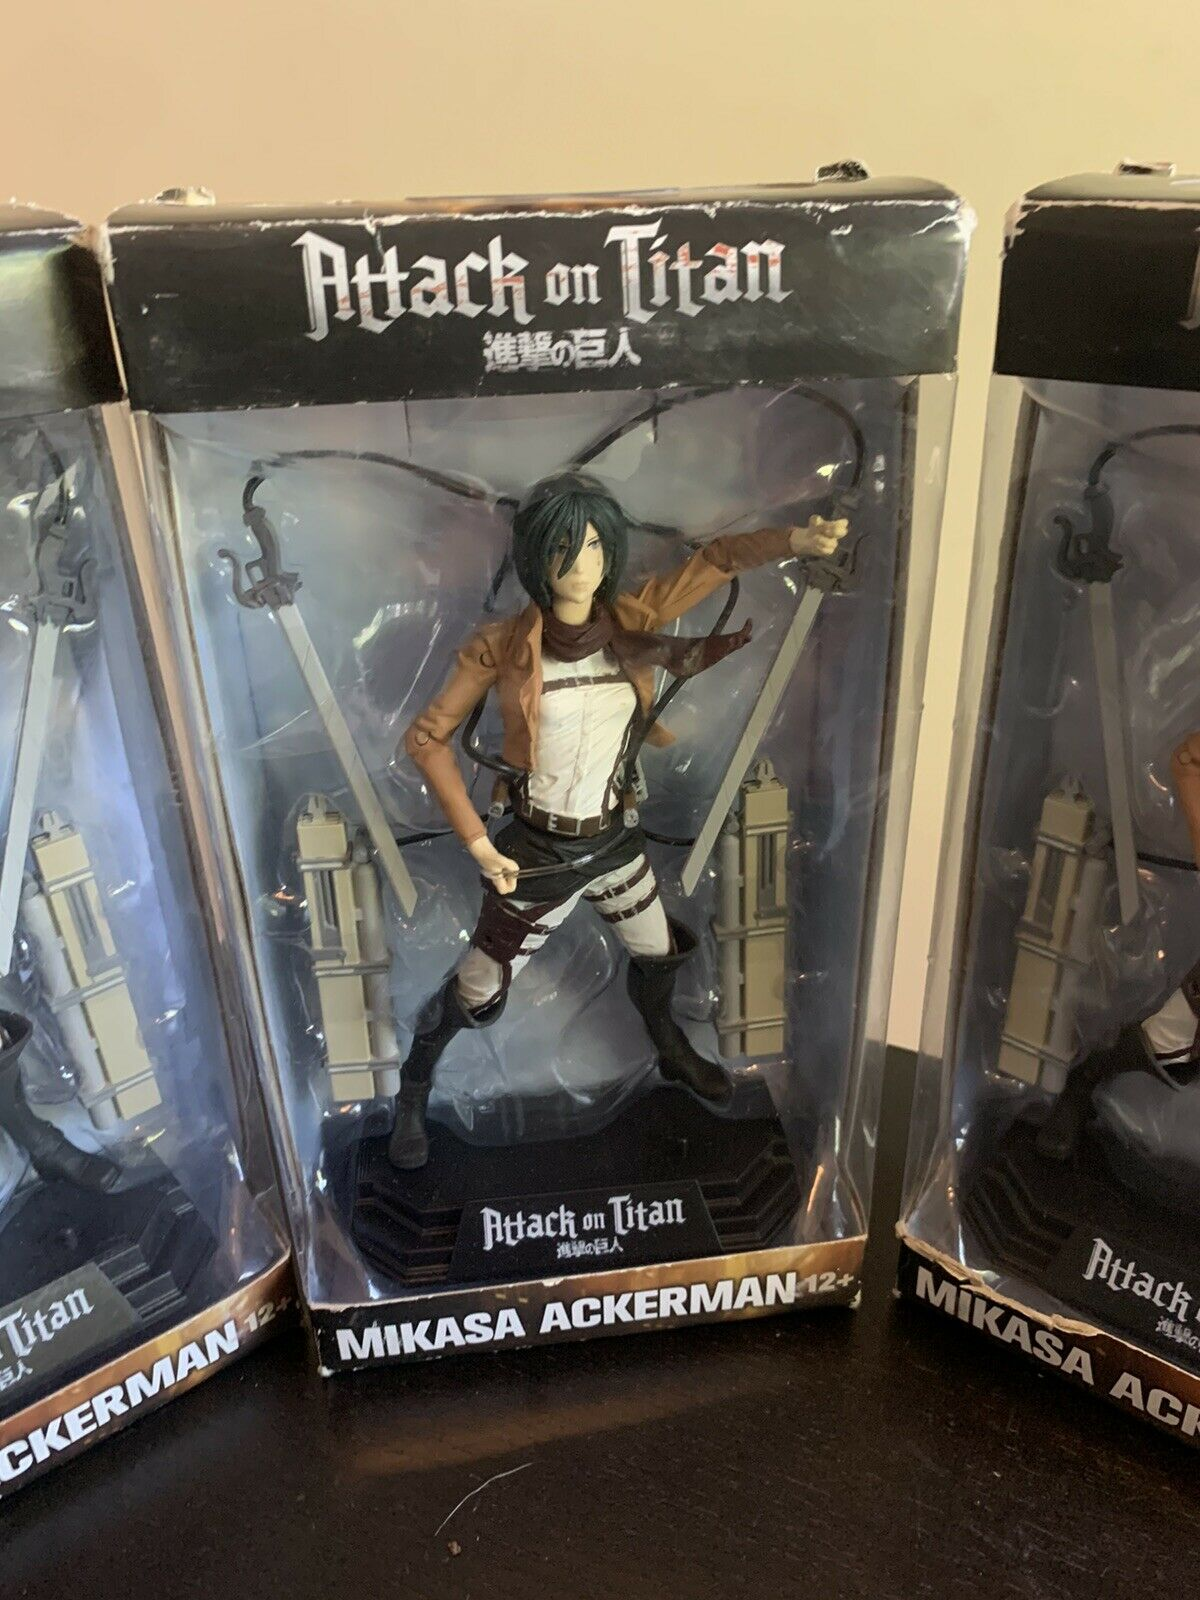 Mikasa Ackerman Boîtier Endommagé Mcfarlane Toys couleur Tops #18 Attack on Titan